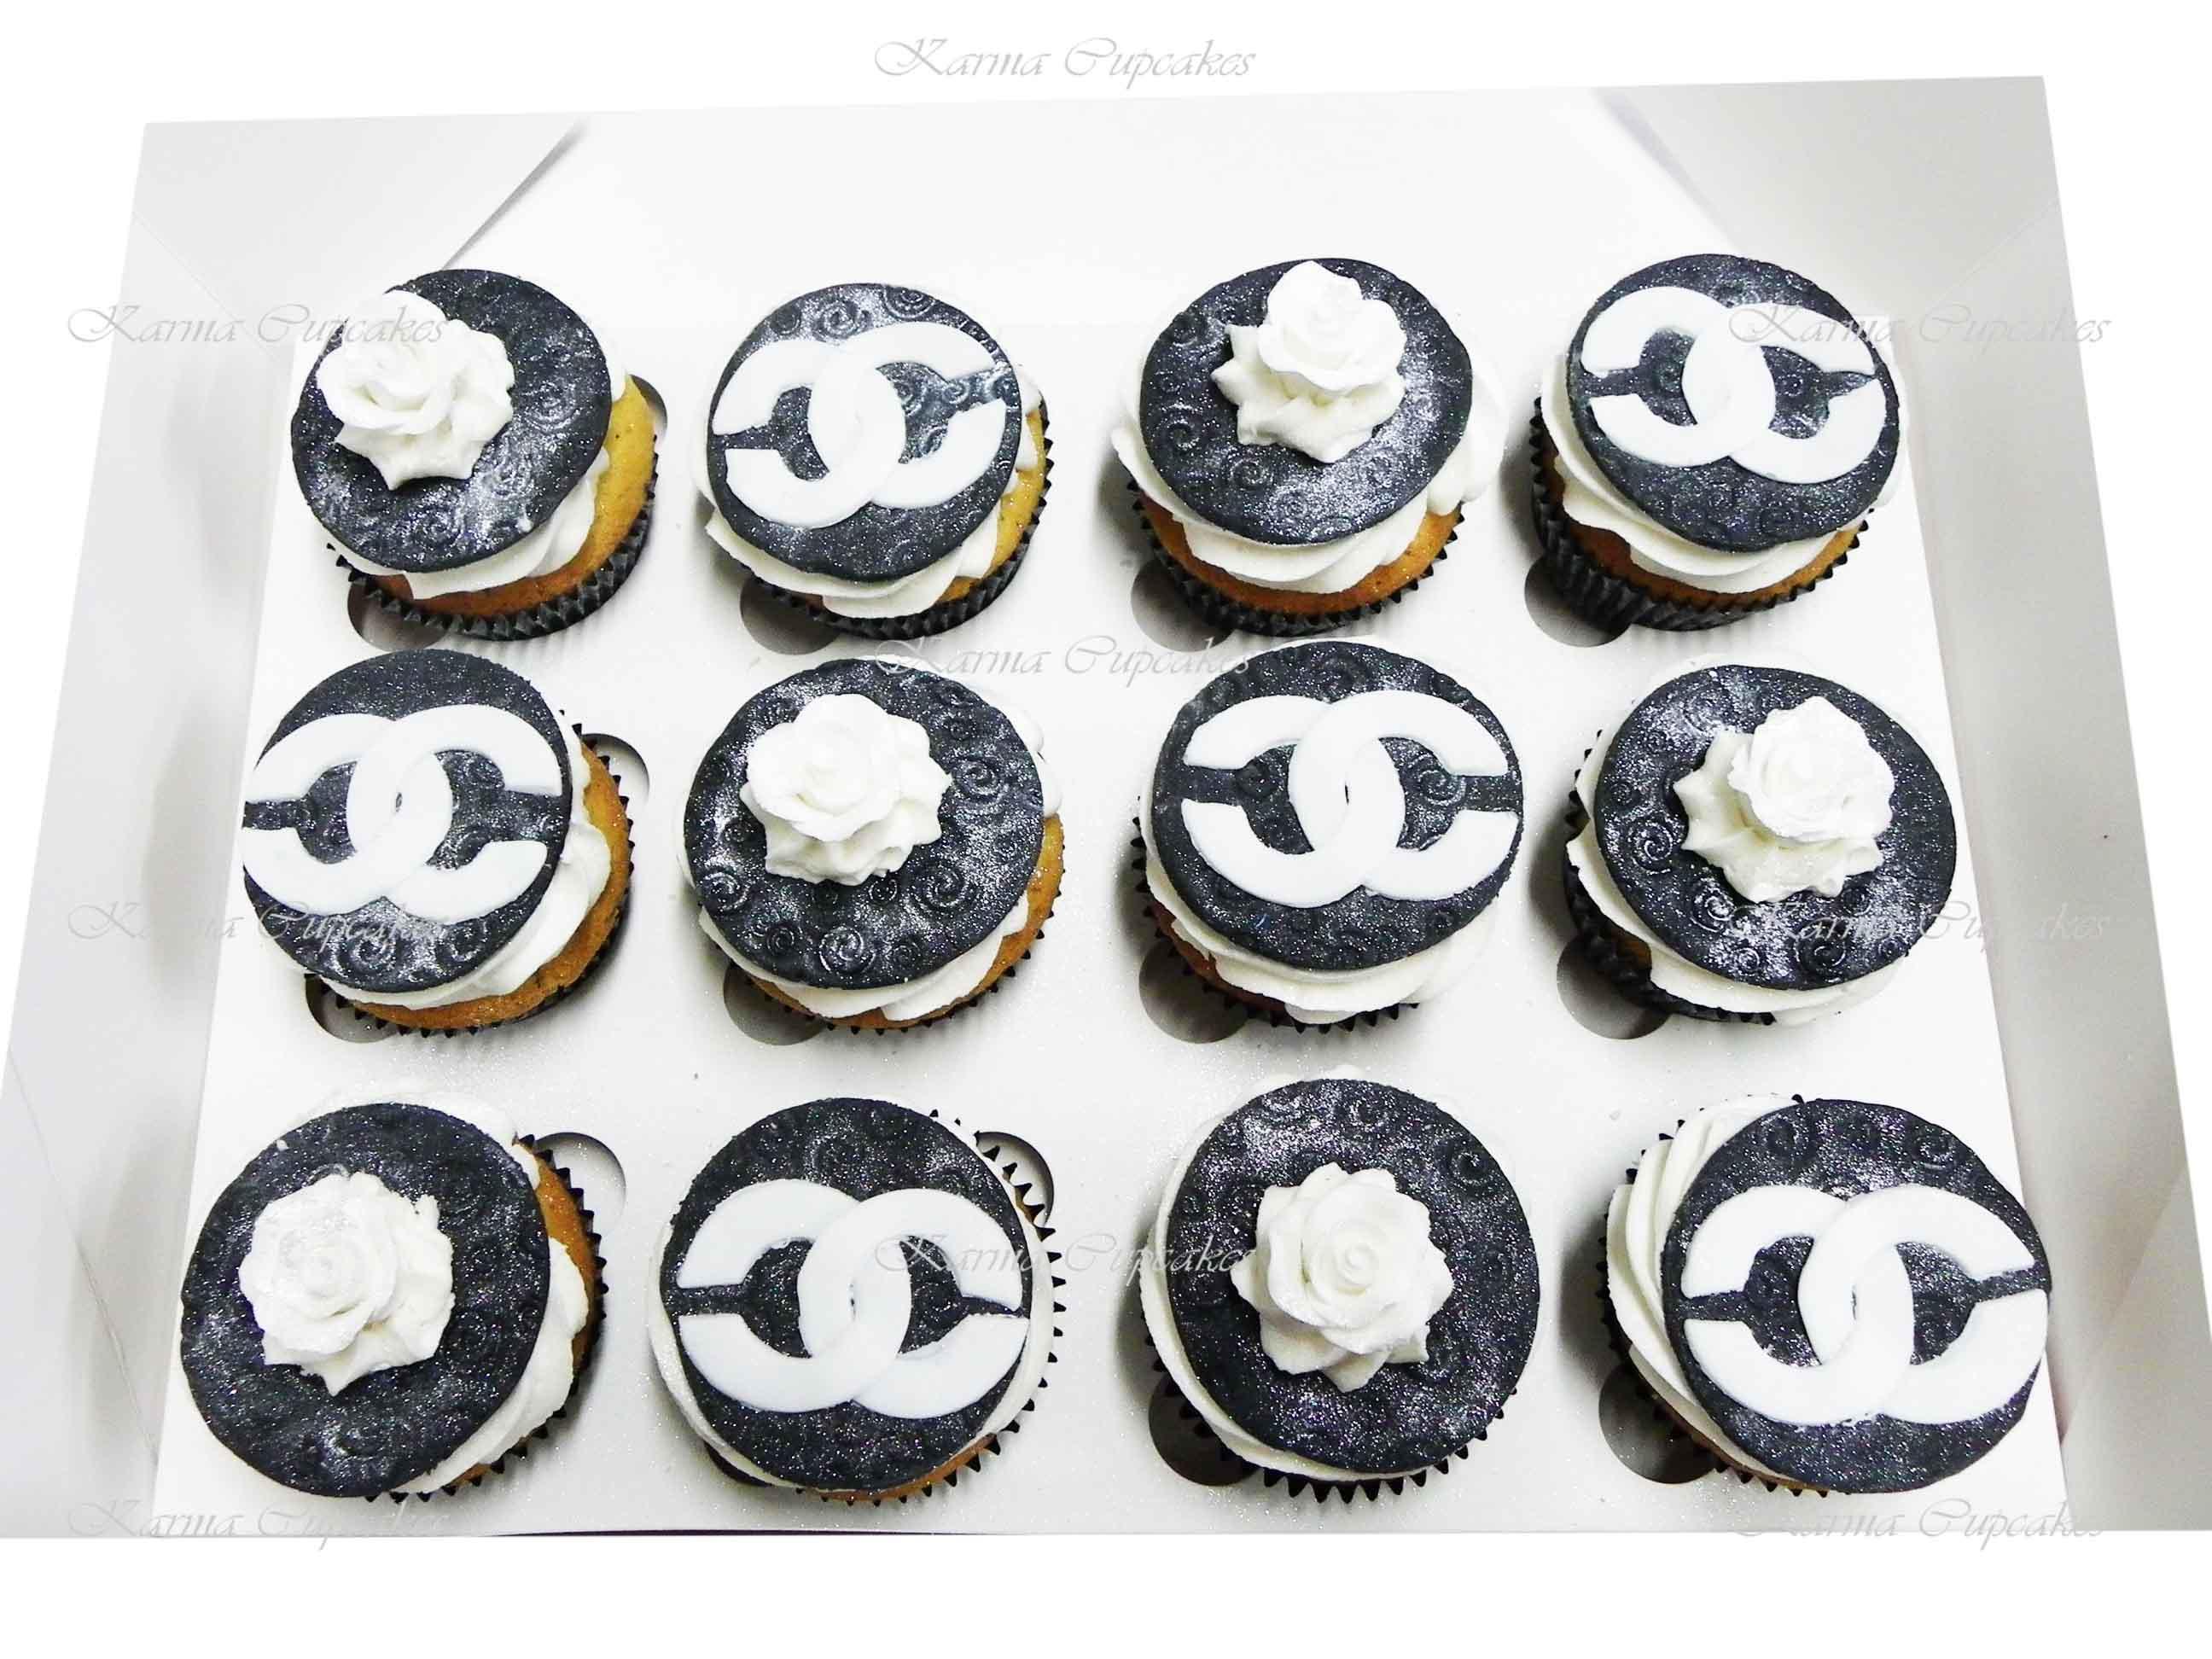 Chanel Cupcakes - Design 1